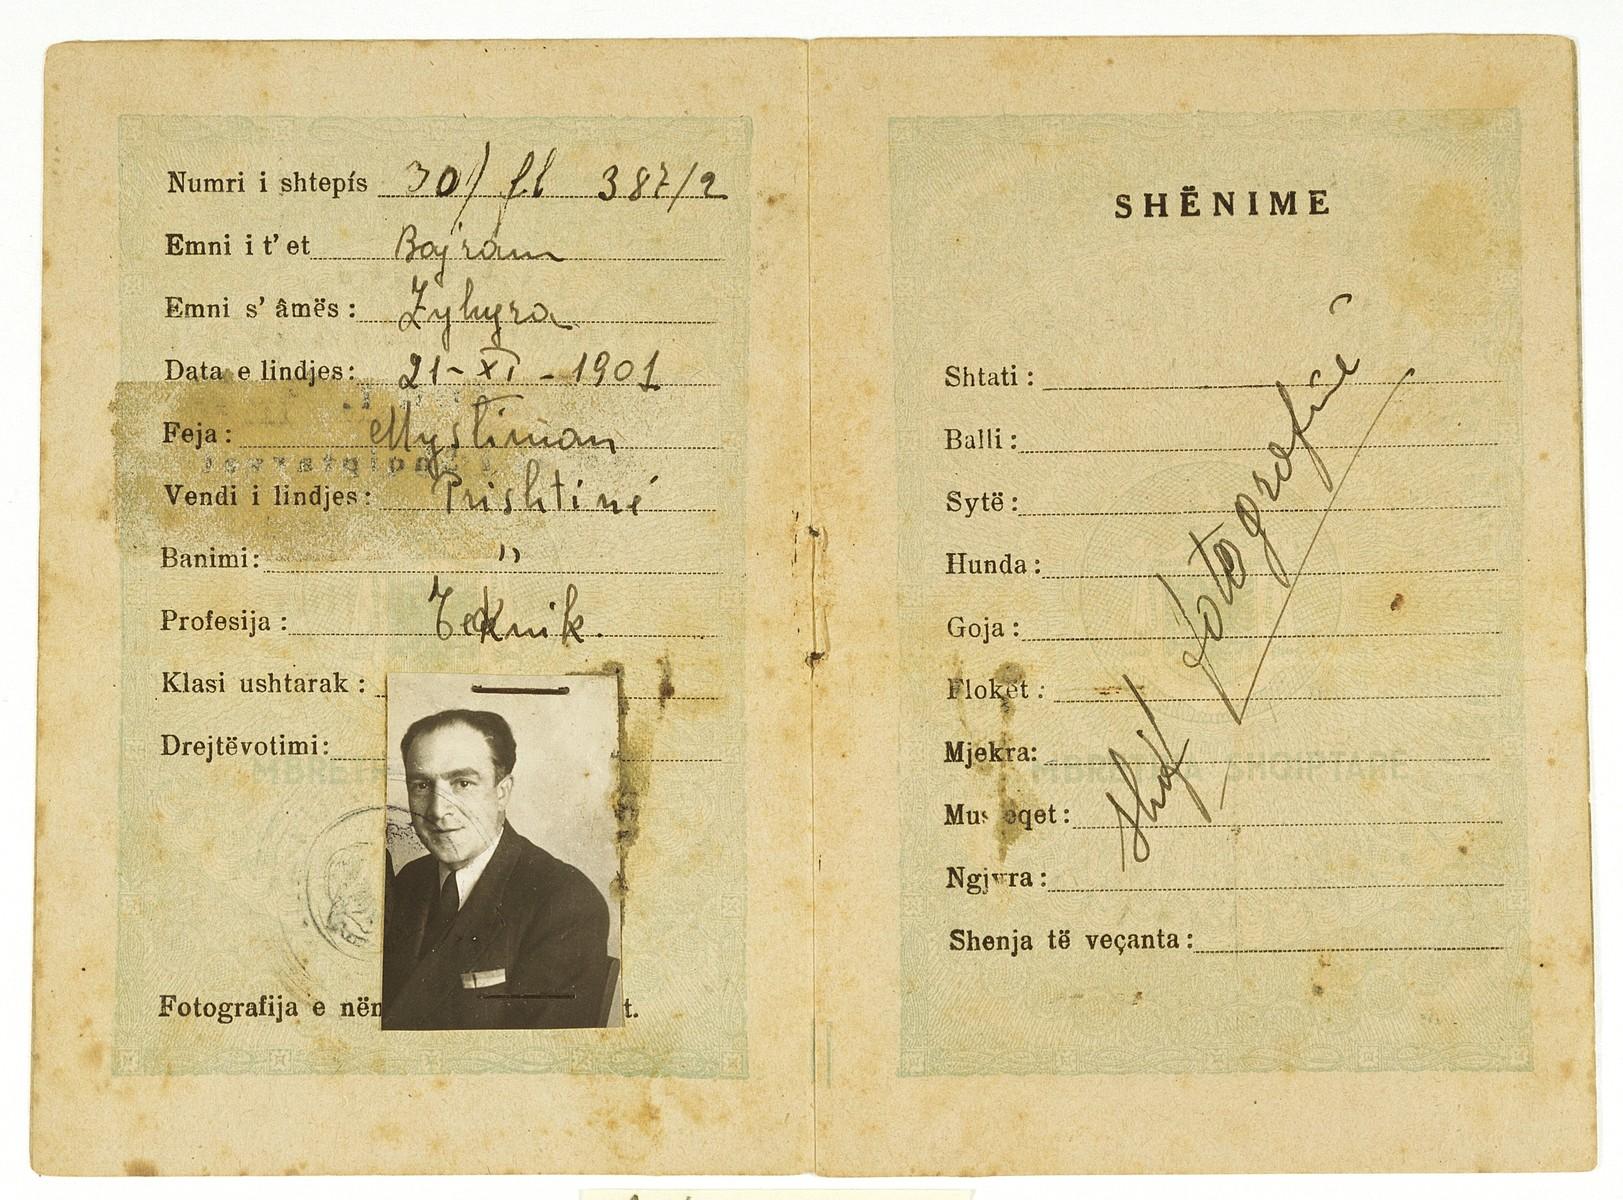 False identification card used by the Jewish refugee Majer Altarac in occupied Yugoslavia.  The identification card was issued in the name of Muharem Bajram Hasani, a Muslim born in Pristina November 21, 1901.